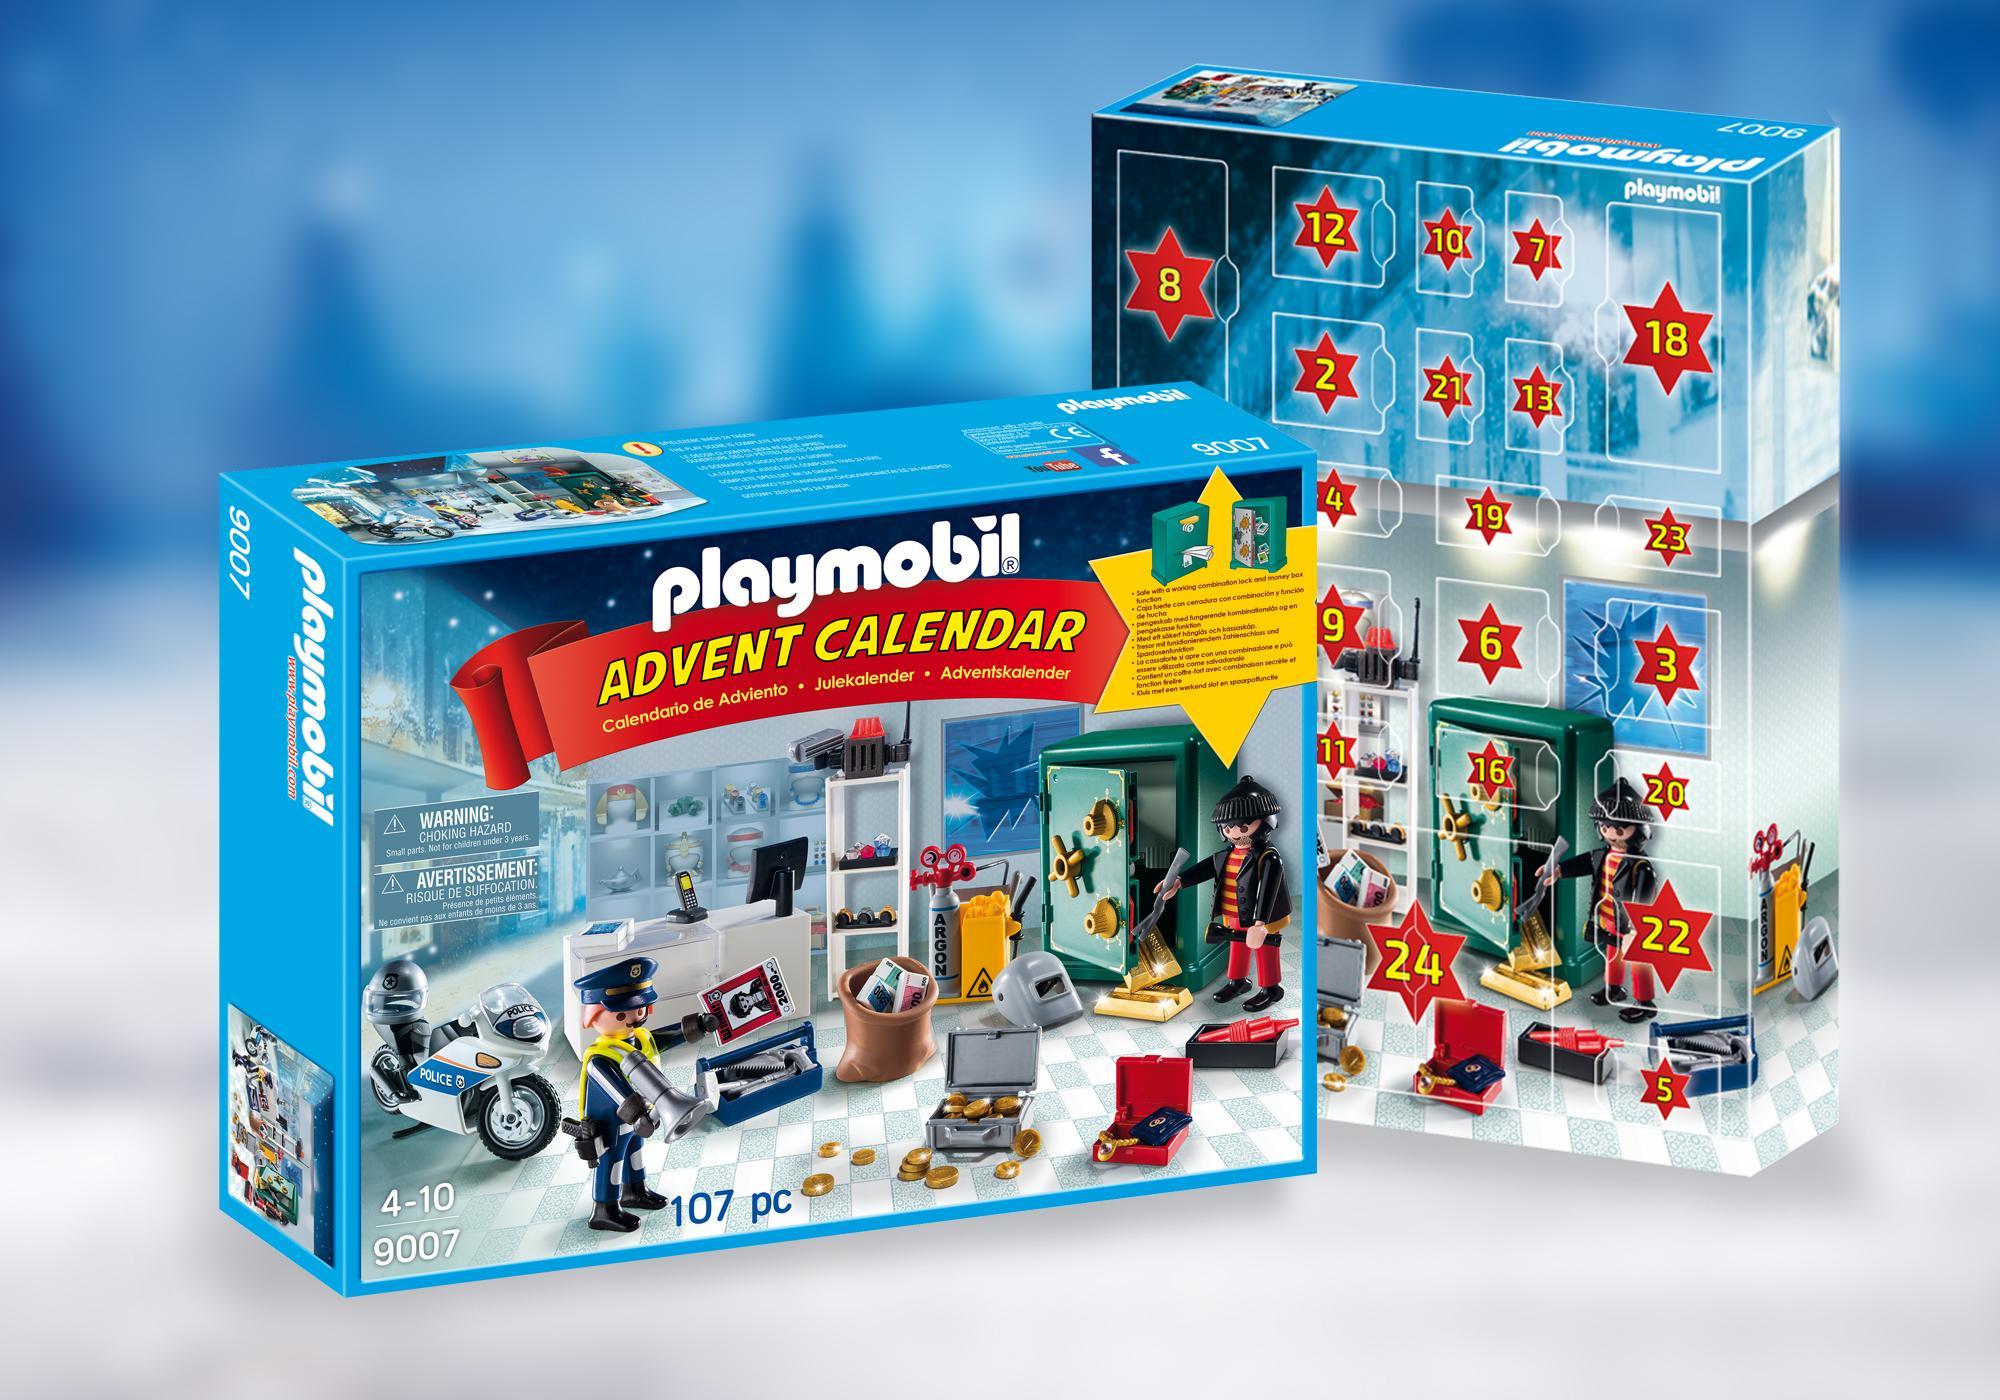 http://media.playmobil.com/i/playmobil/9007_product_detail